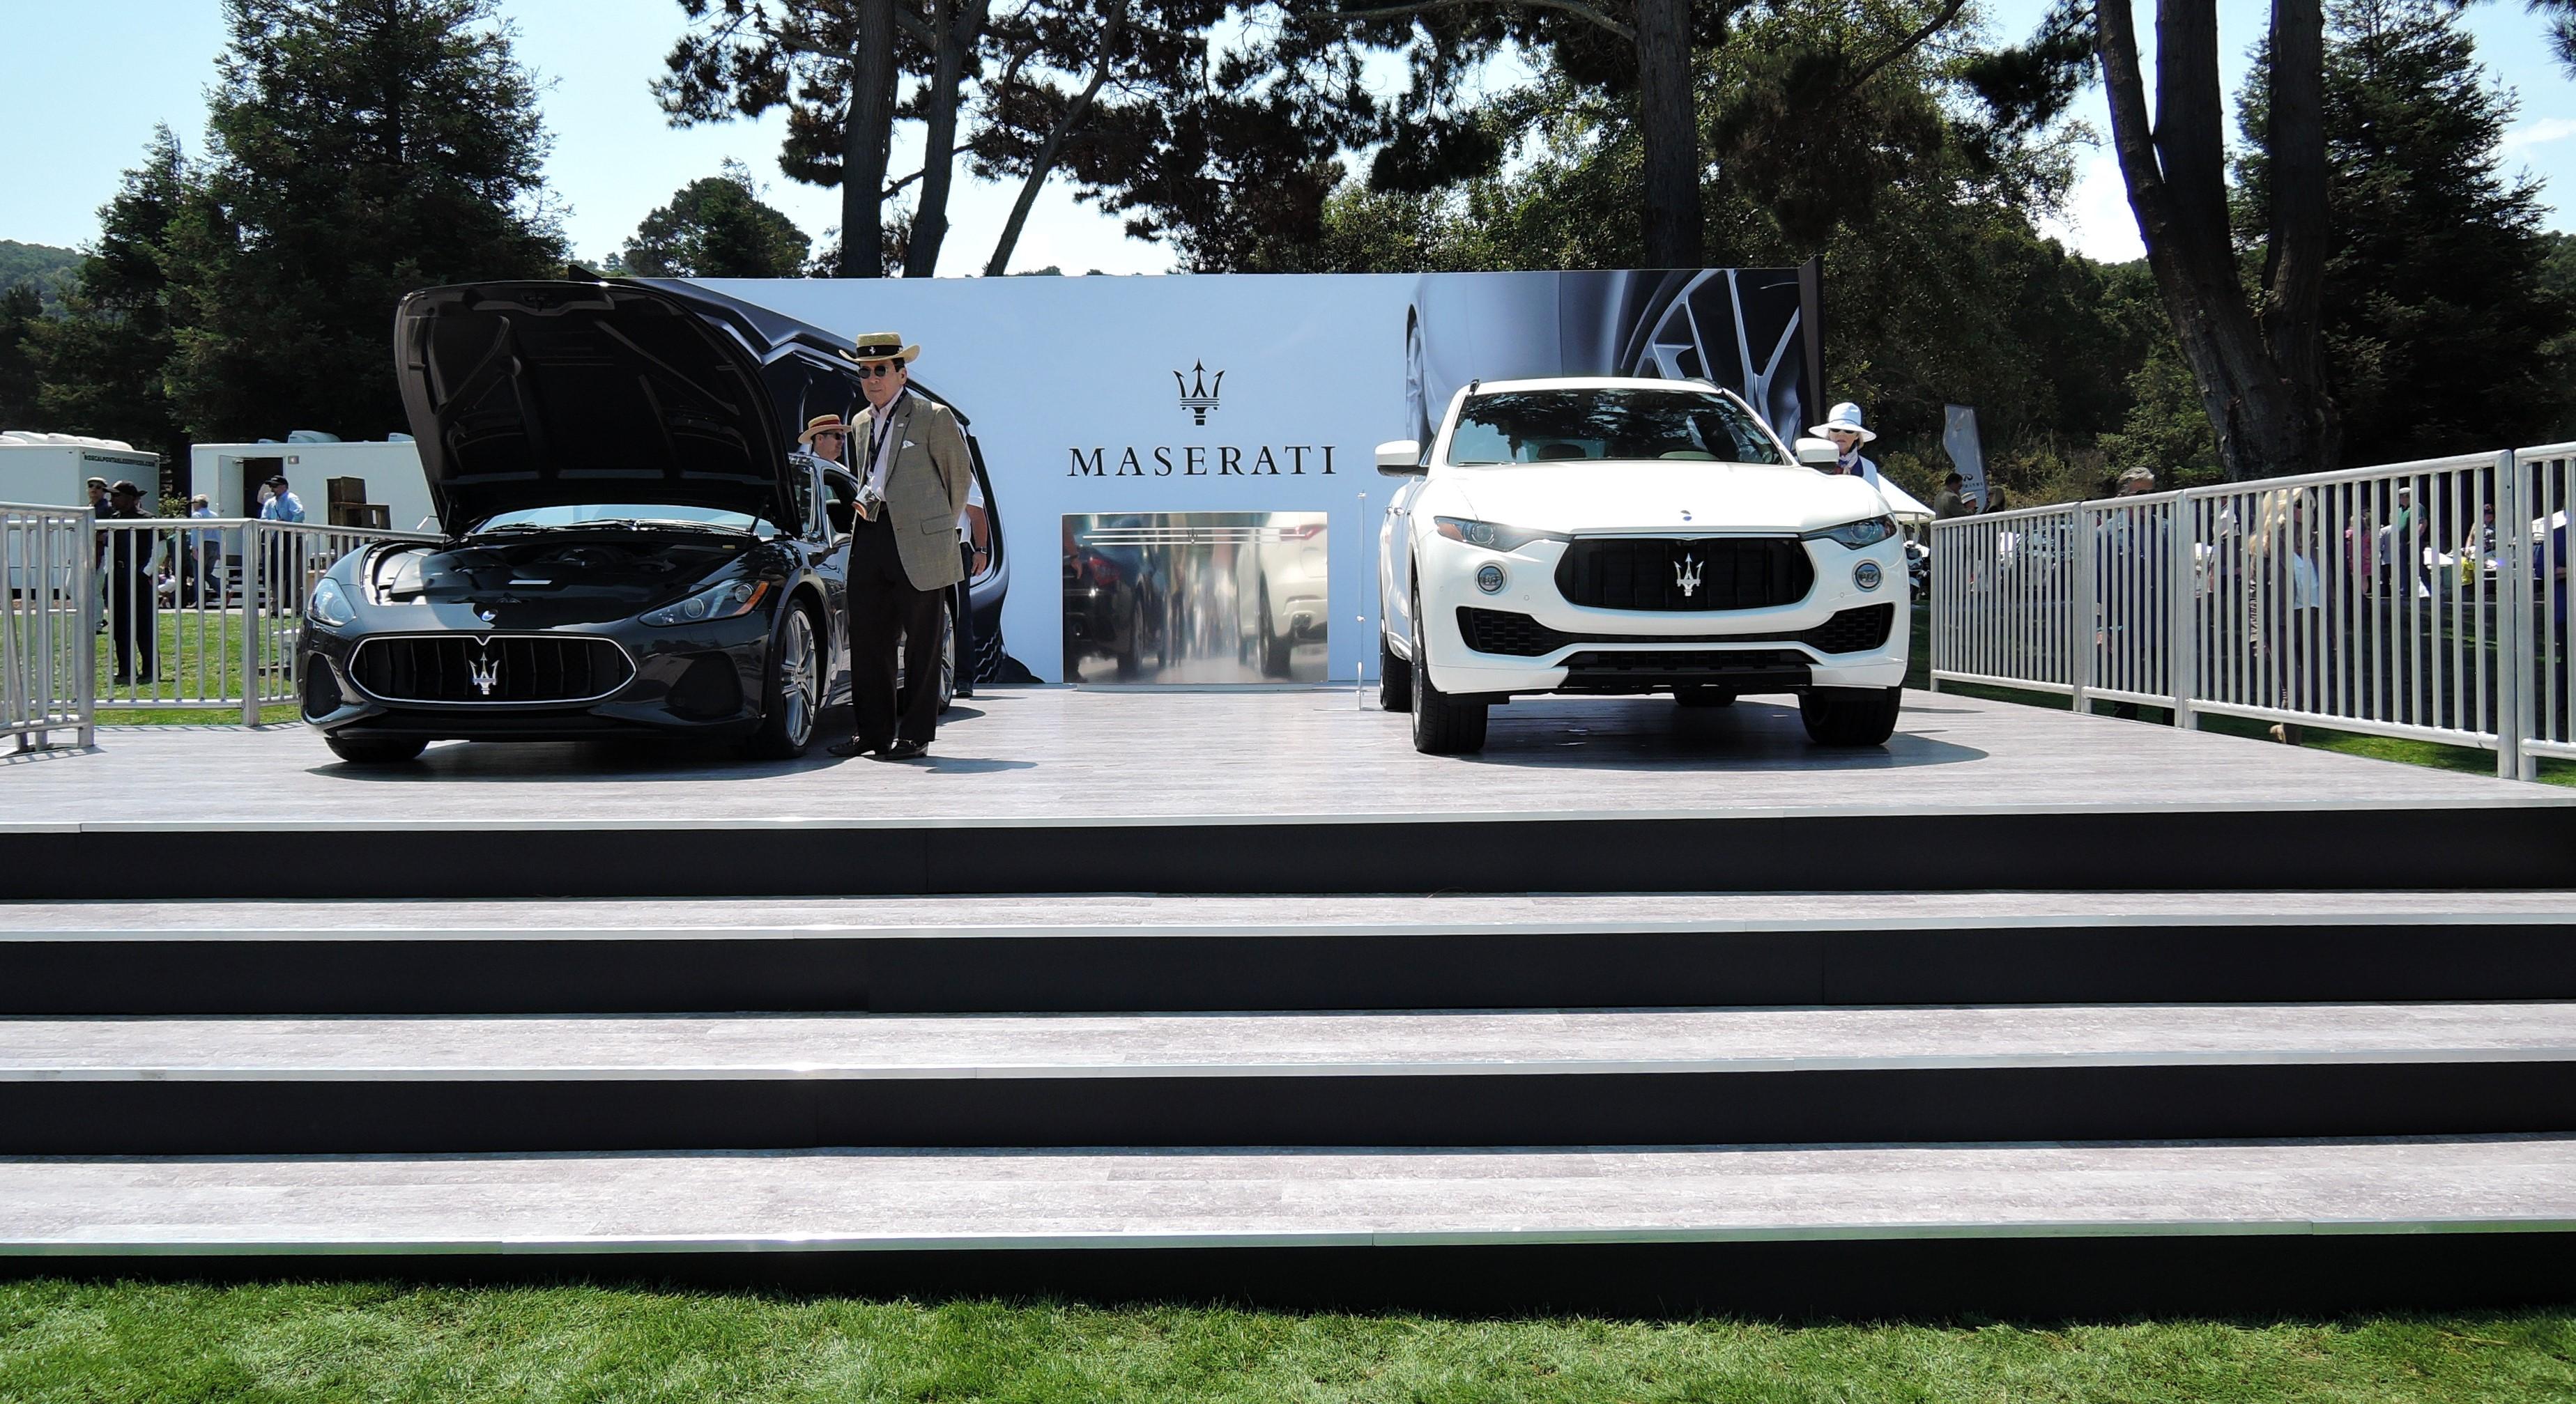 Maserati - The Quail 2017